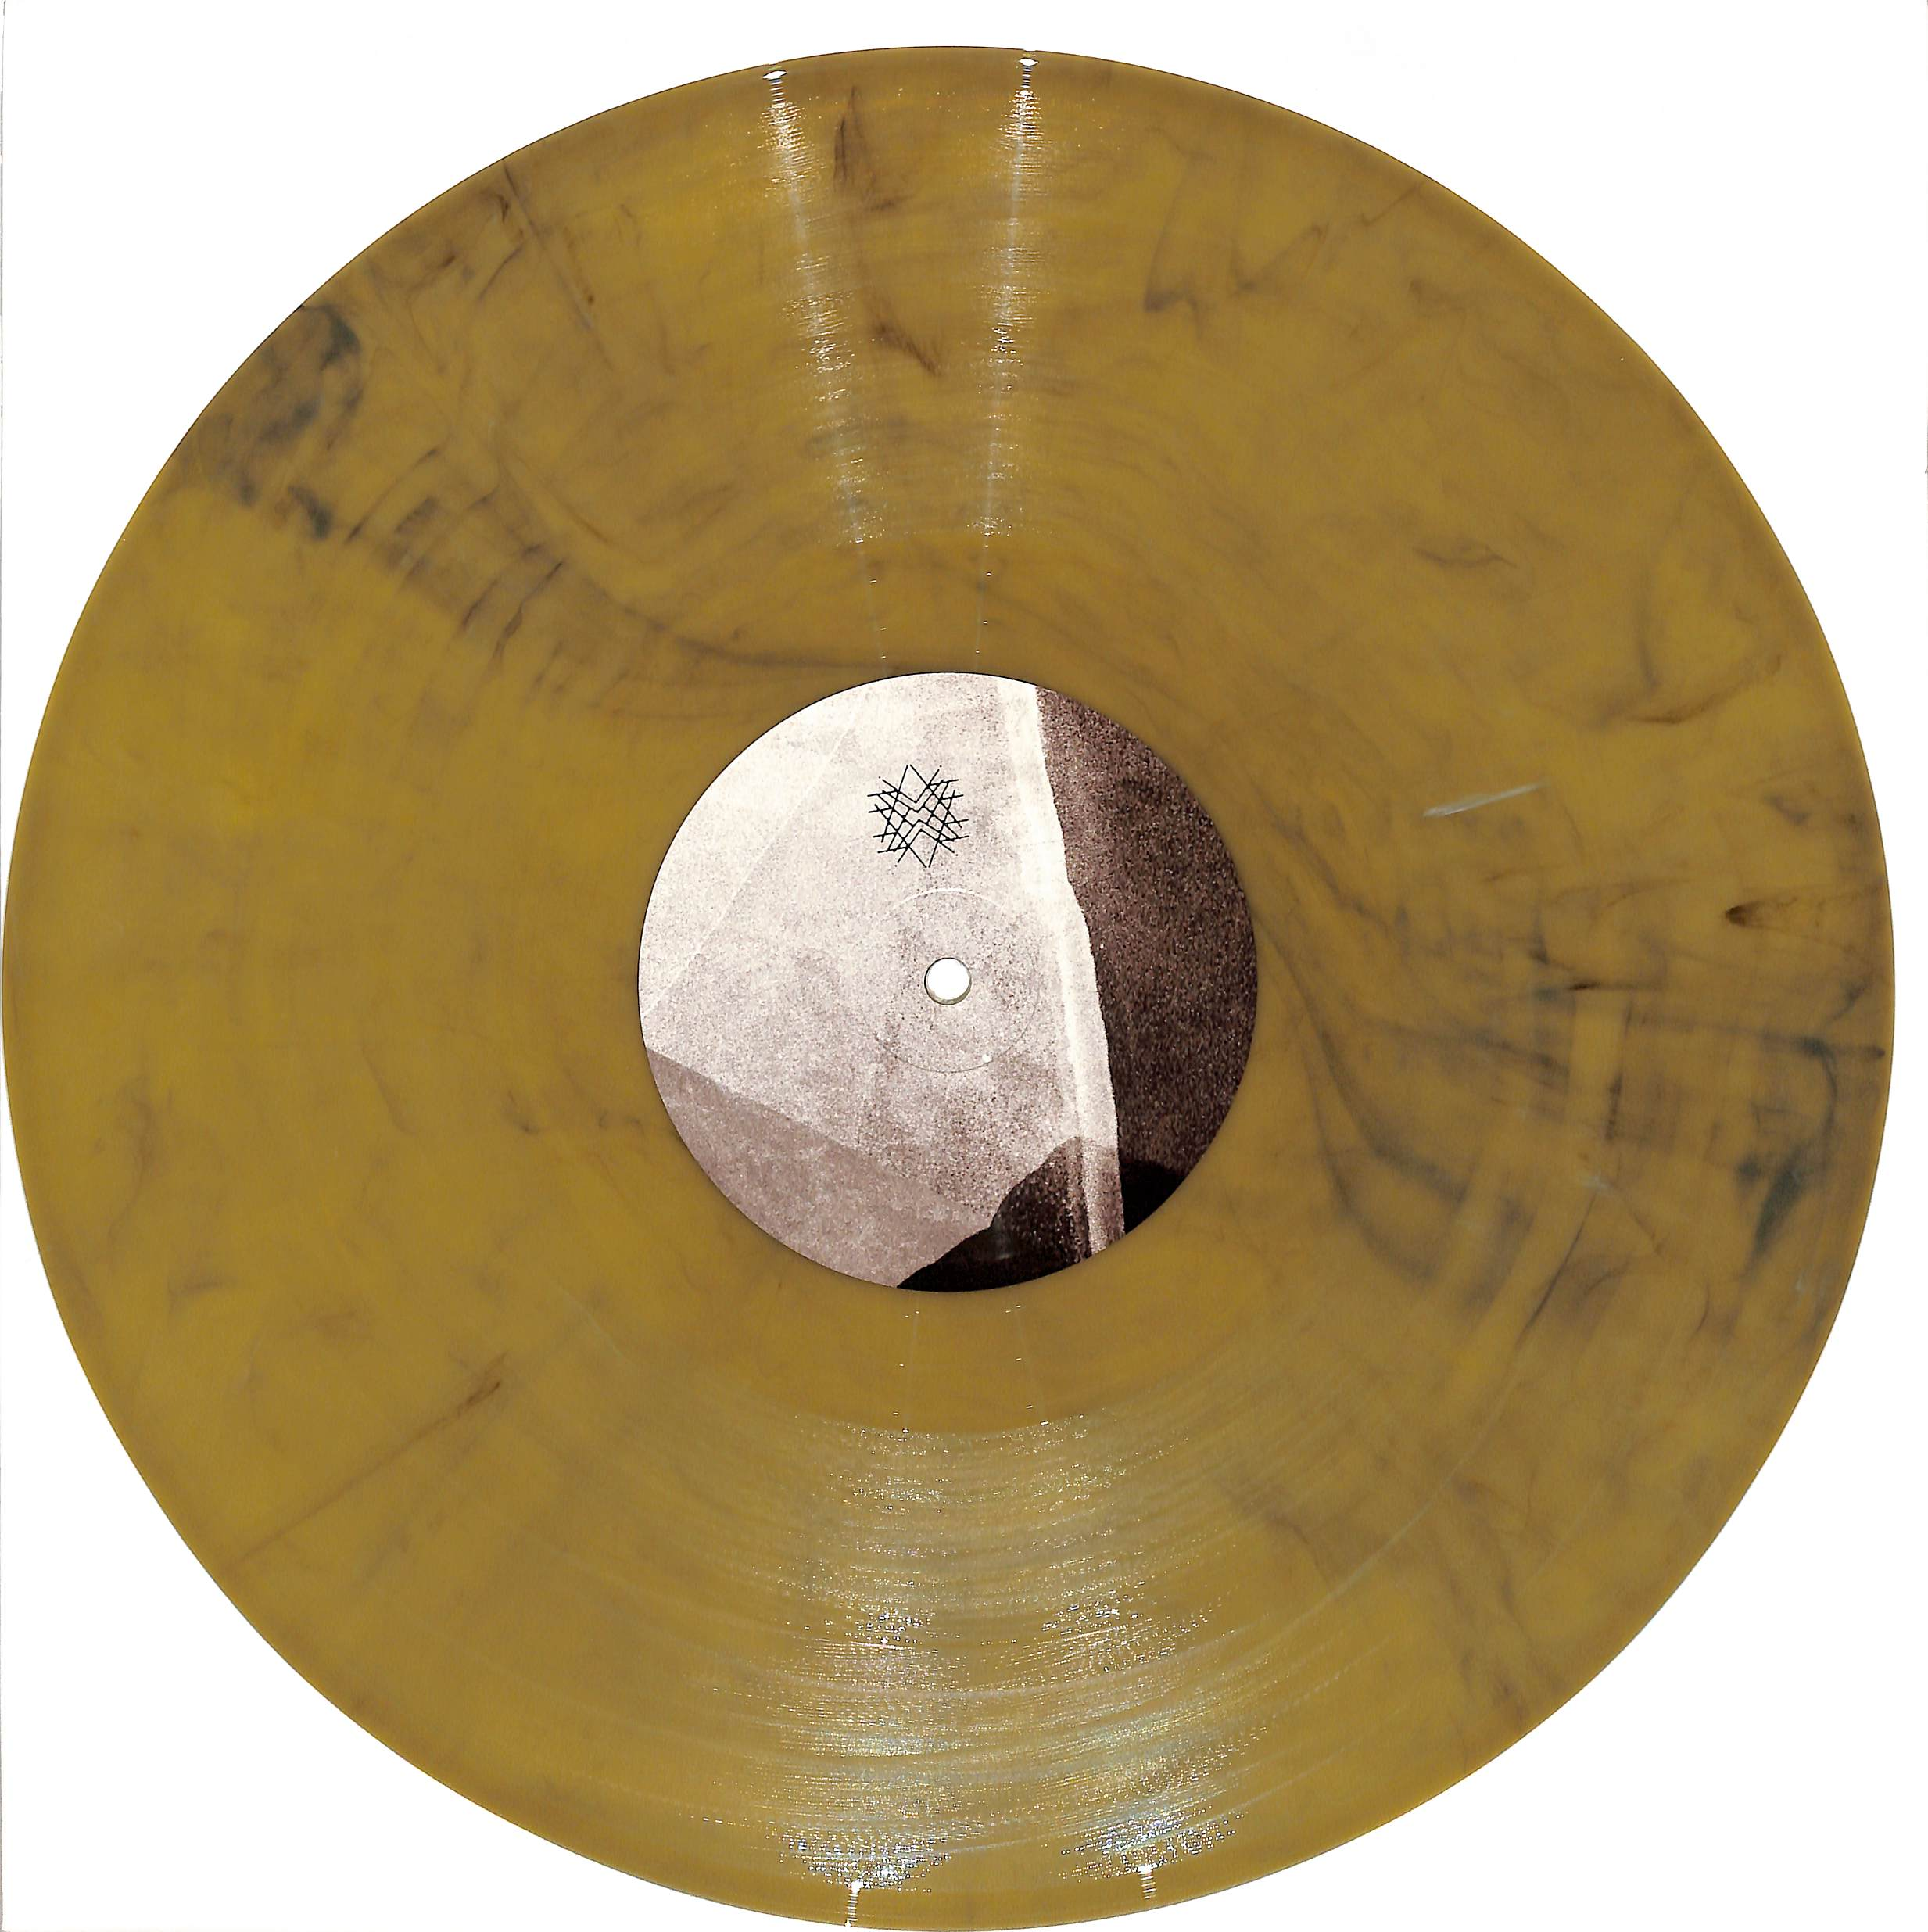 Setaoc Mass - SOLID VOID EP